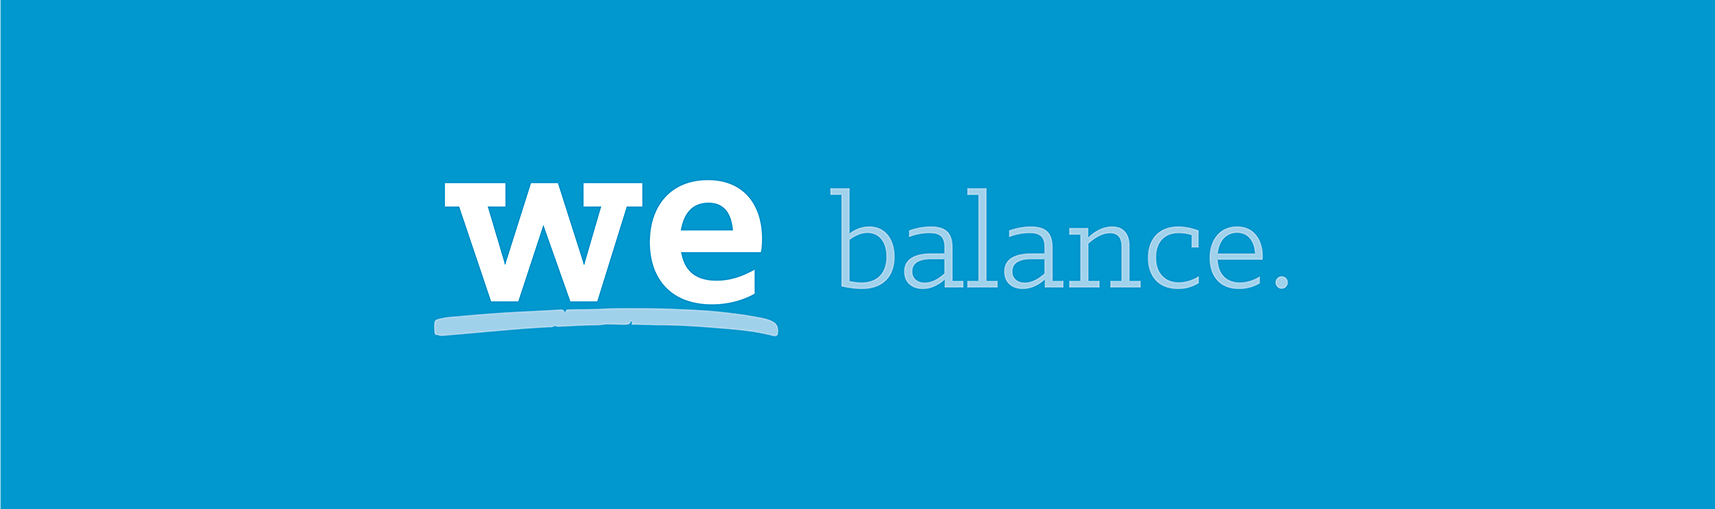 We Balance.